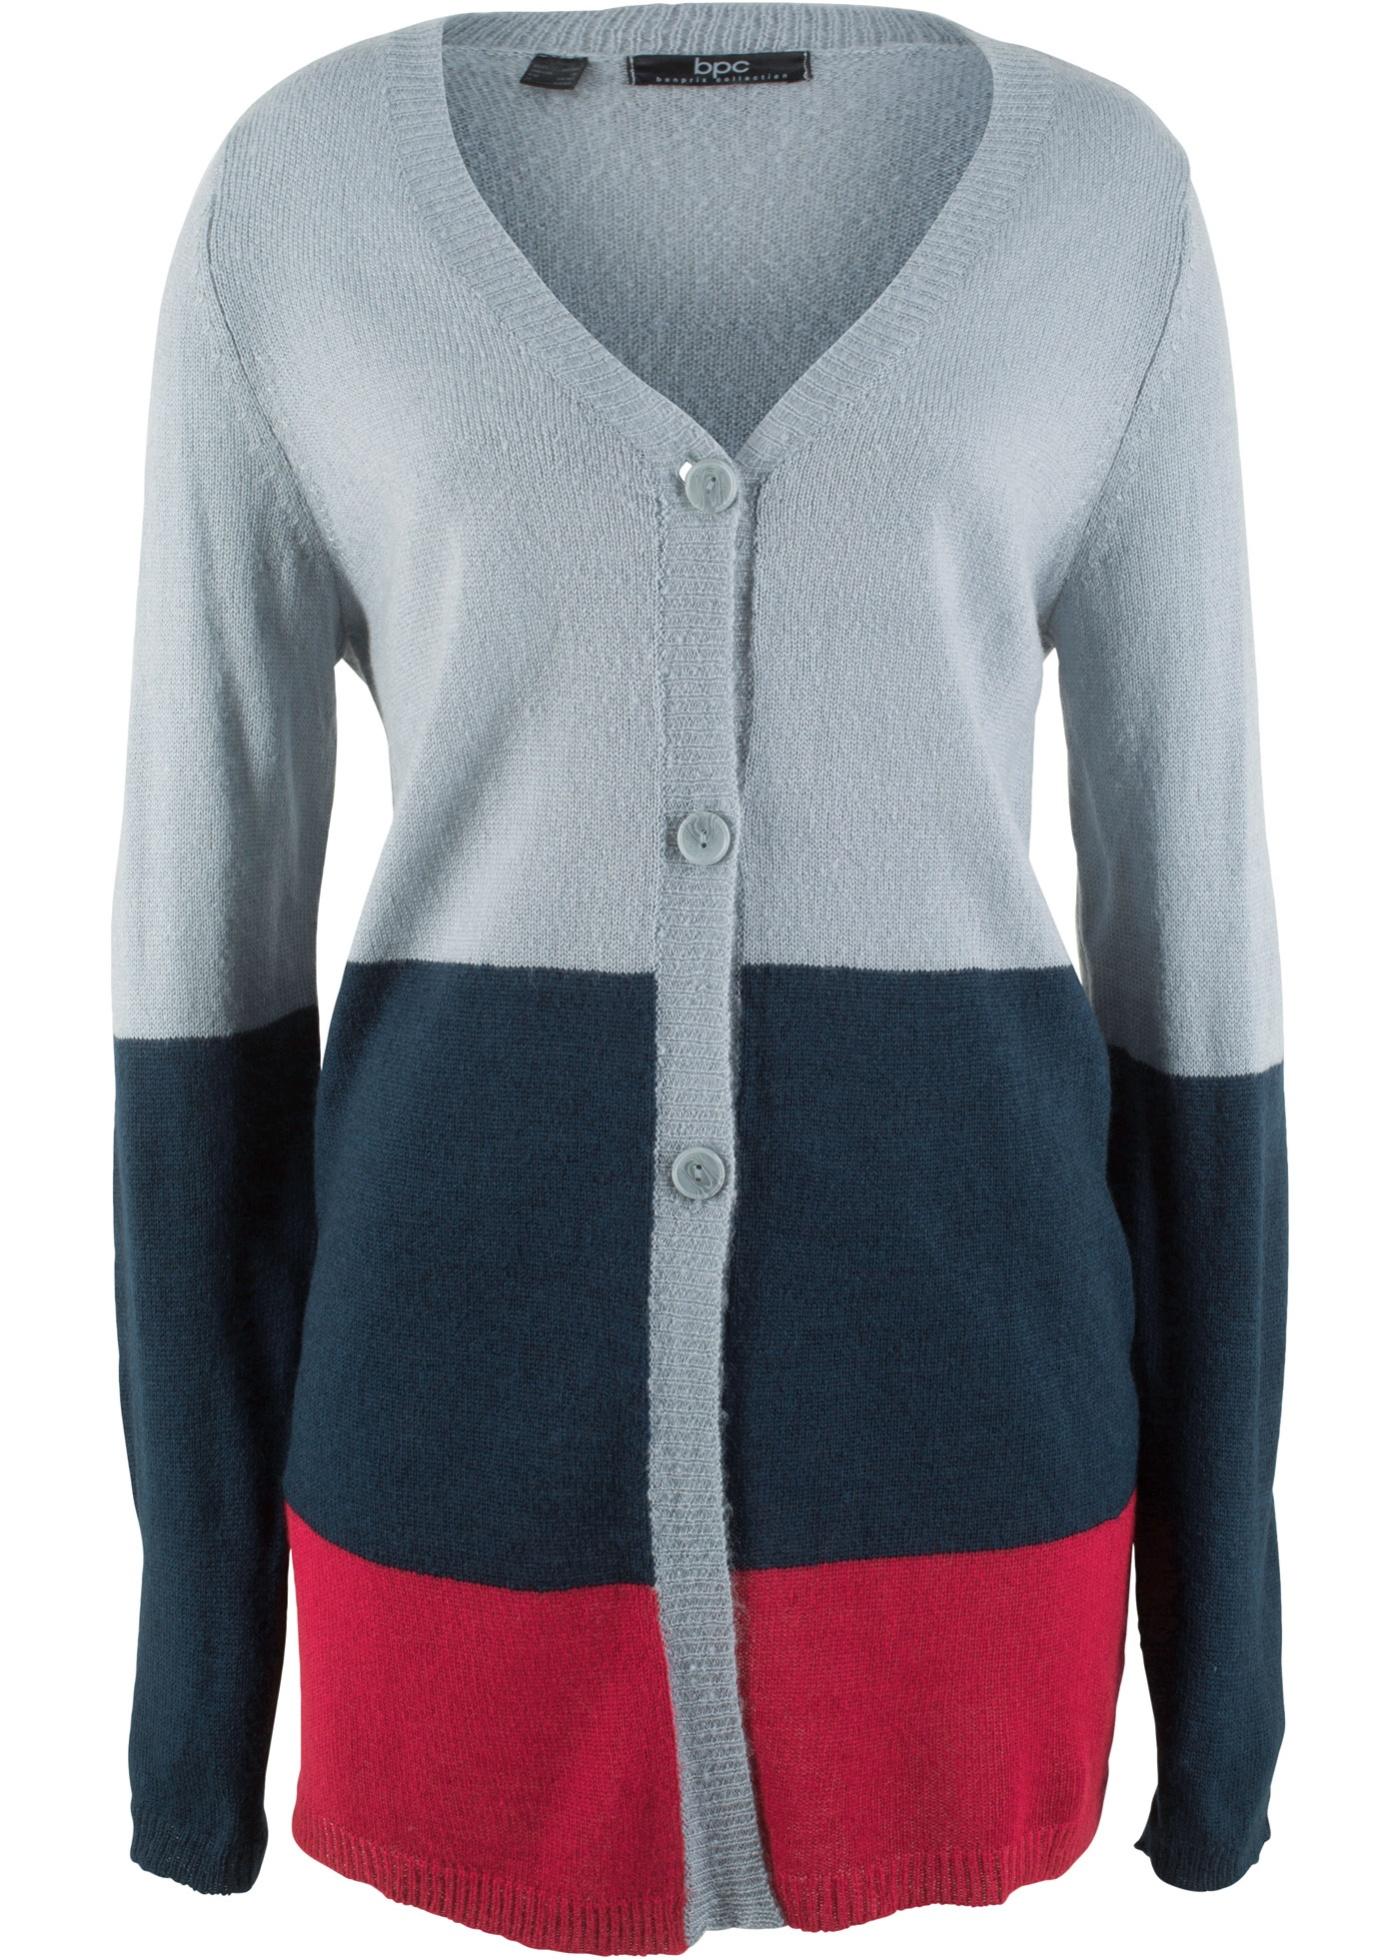 Pletený kabátek, dlouhý rukáv - Stříbrná